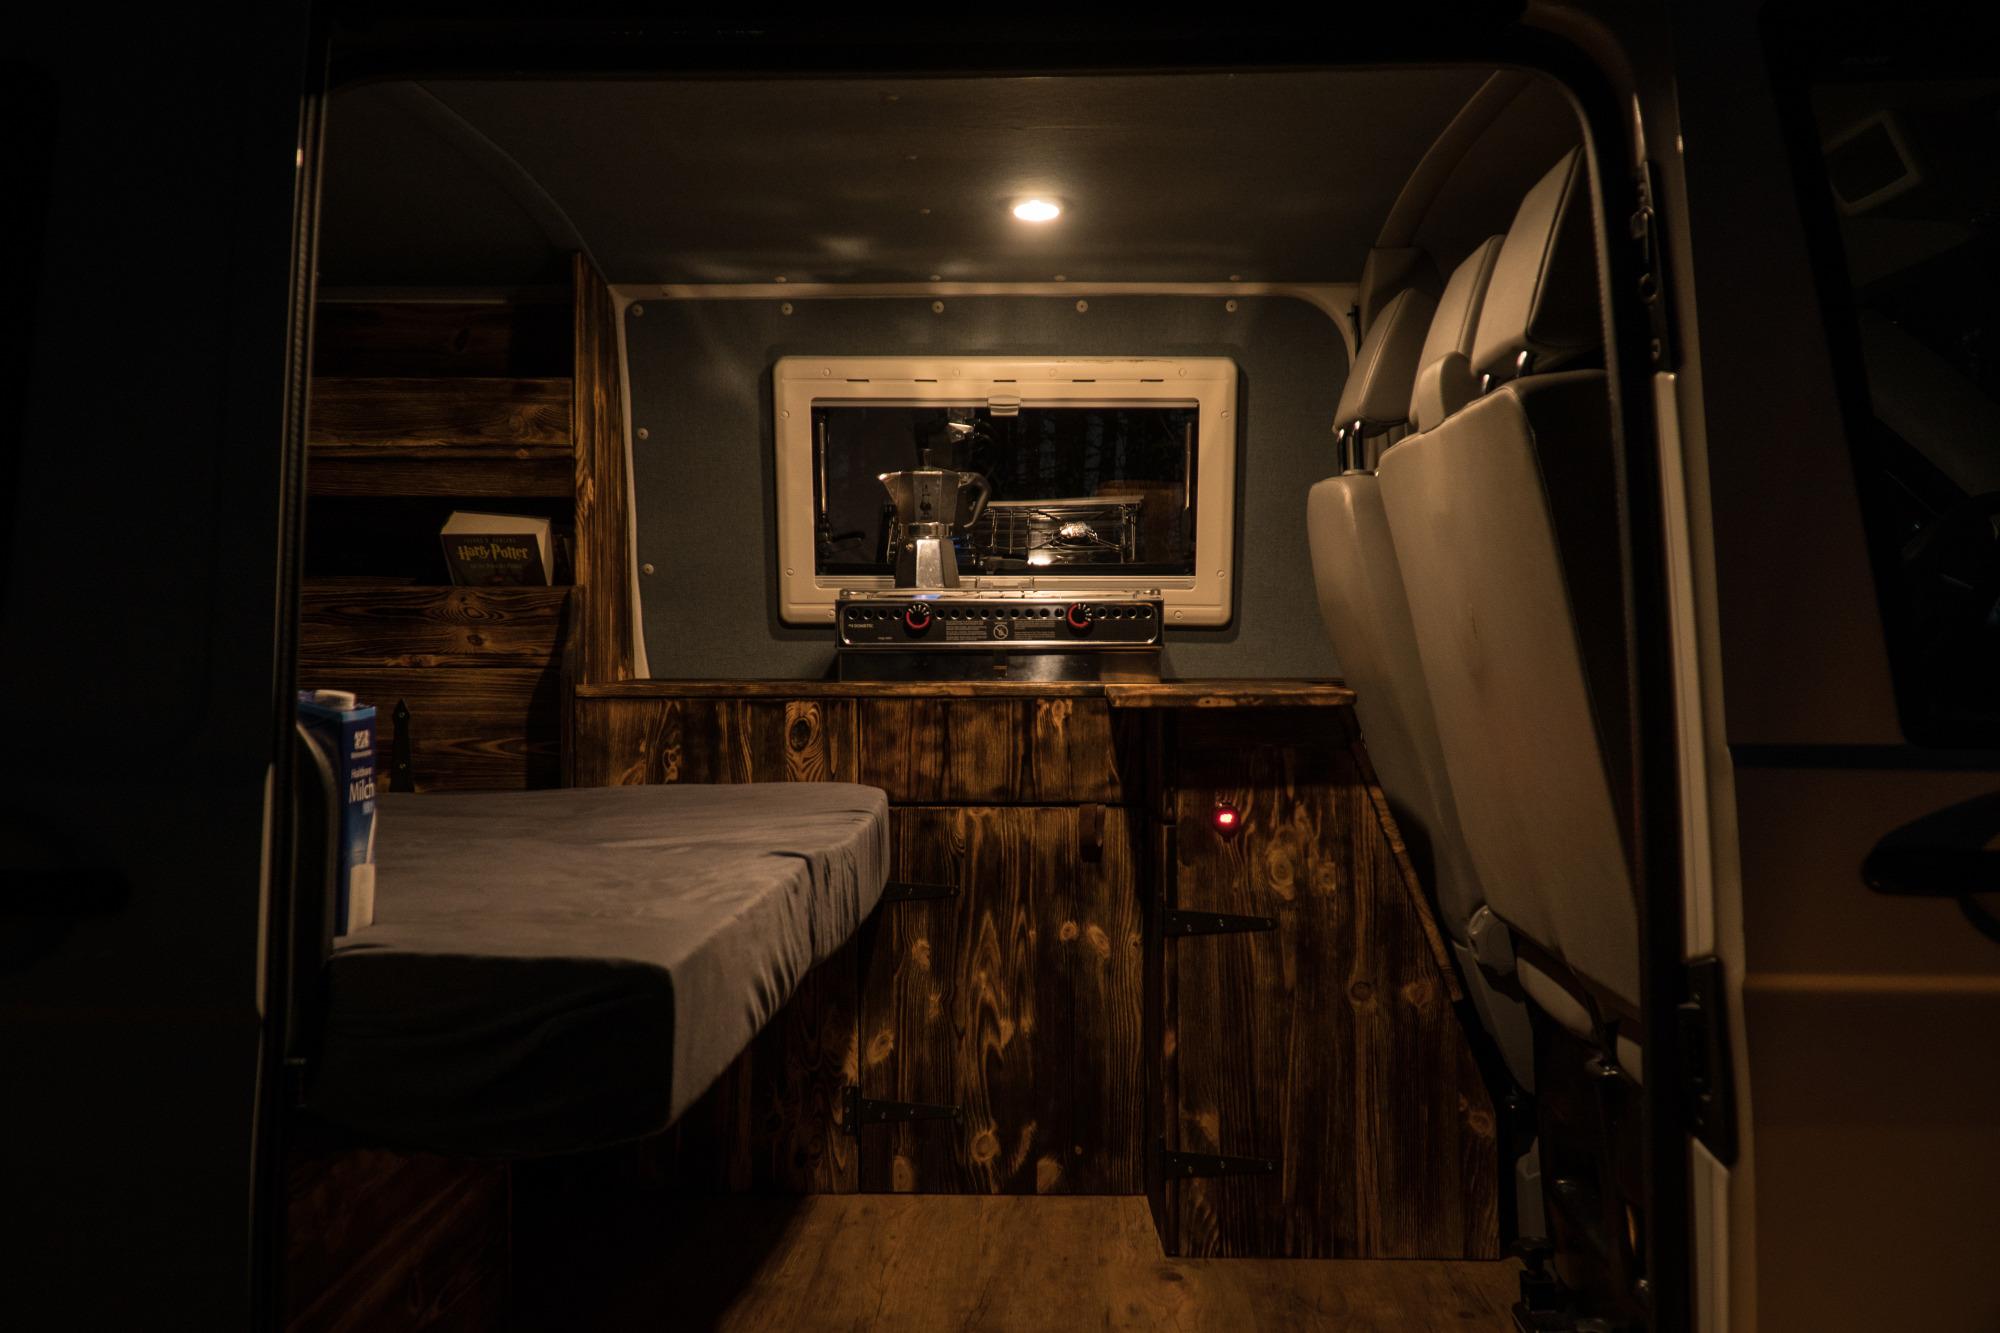 VW T5 Camper Innenausbau Küche